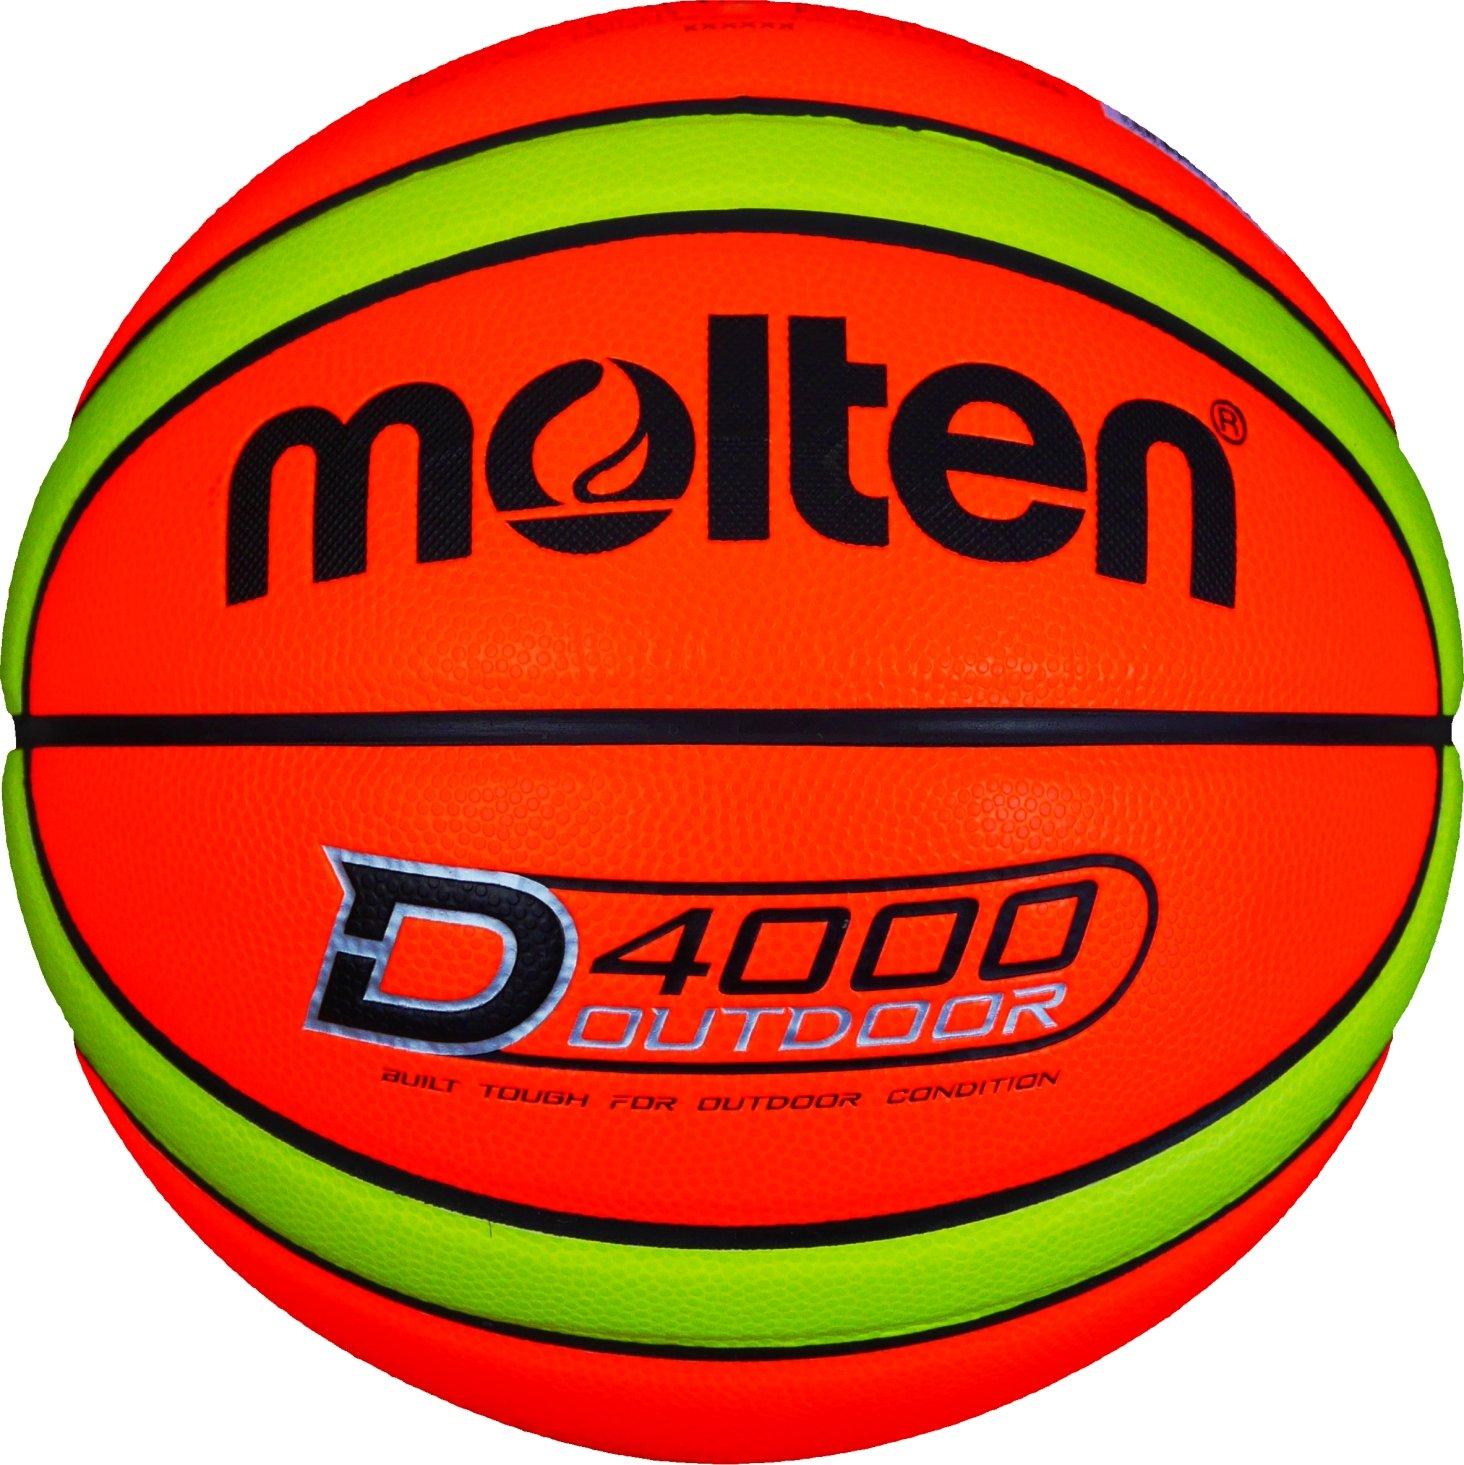 MOLTEN Hombre b7d4000 Baloncesto, Naranja, 7: Amazon.es: Deportes ...